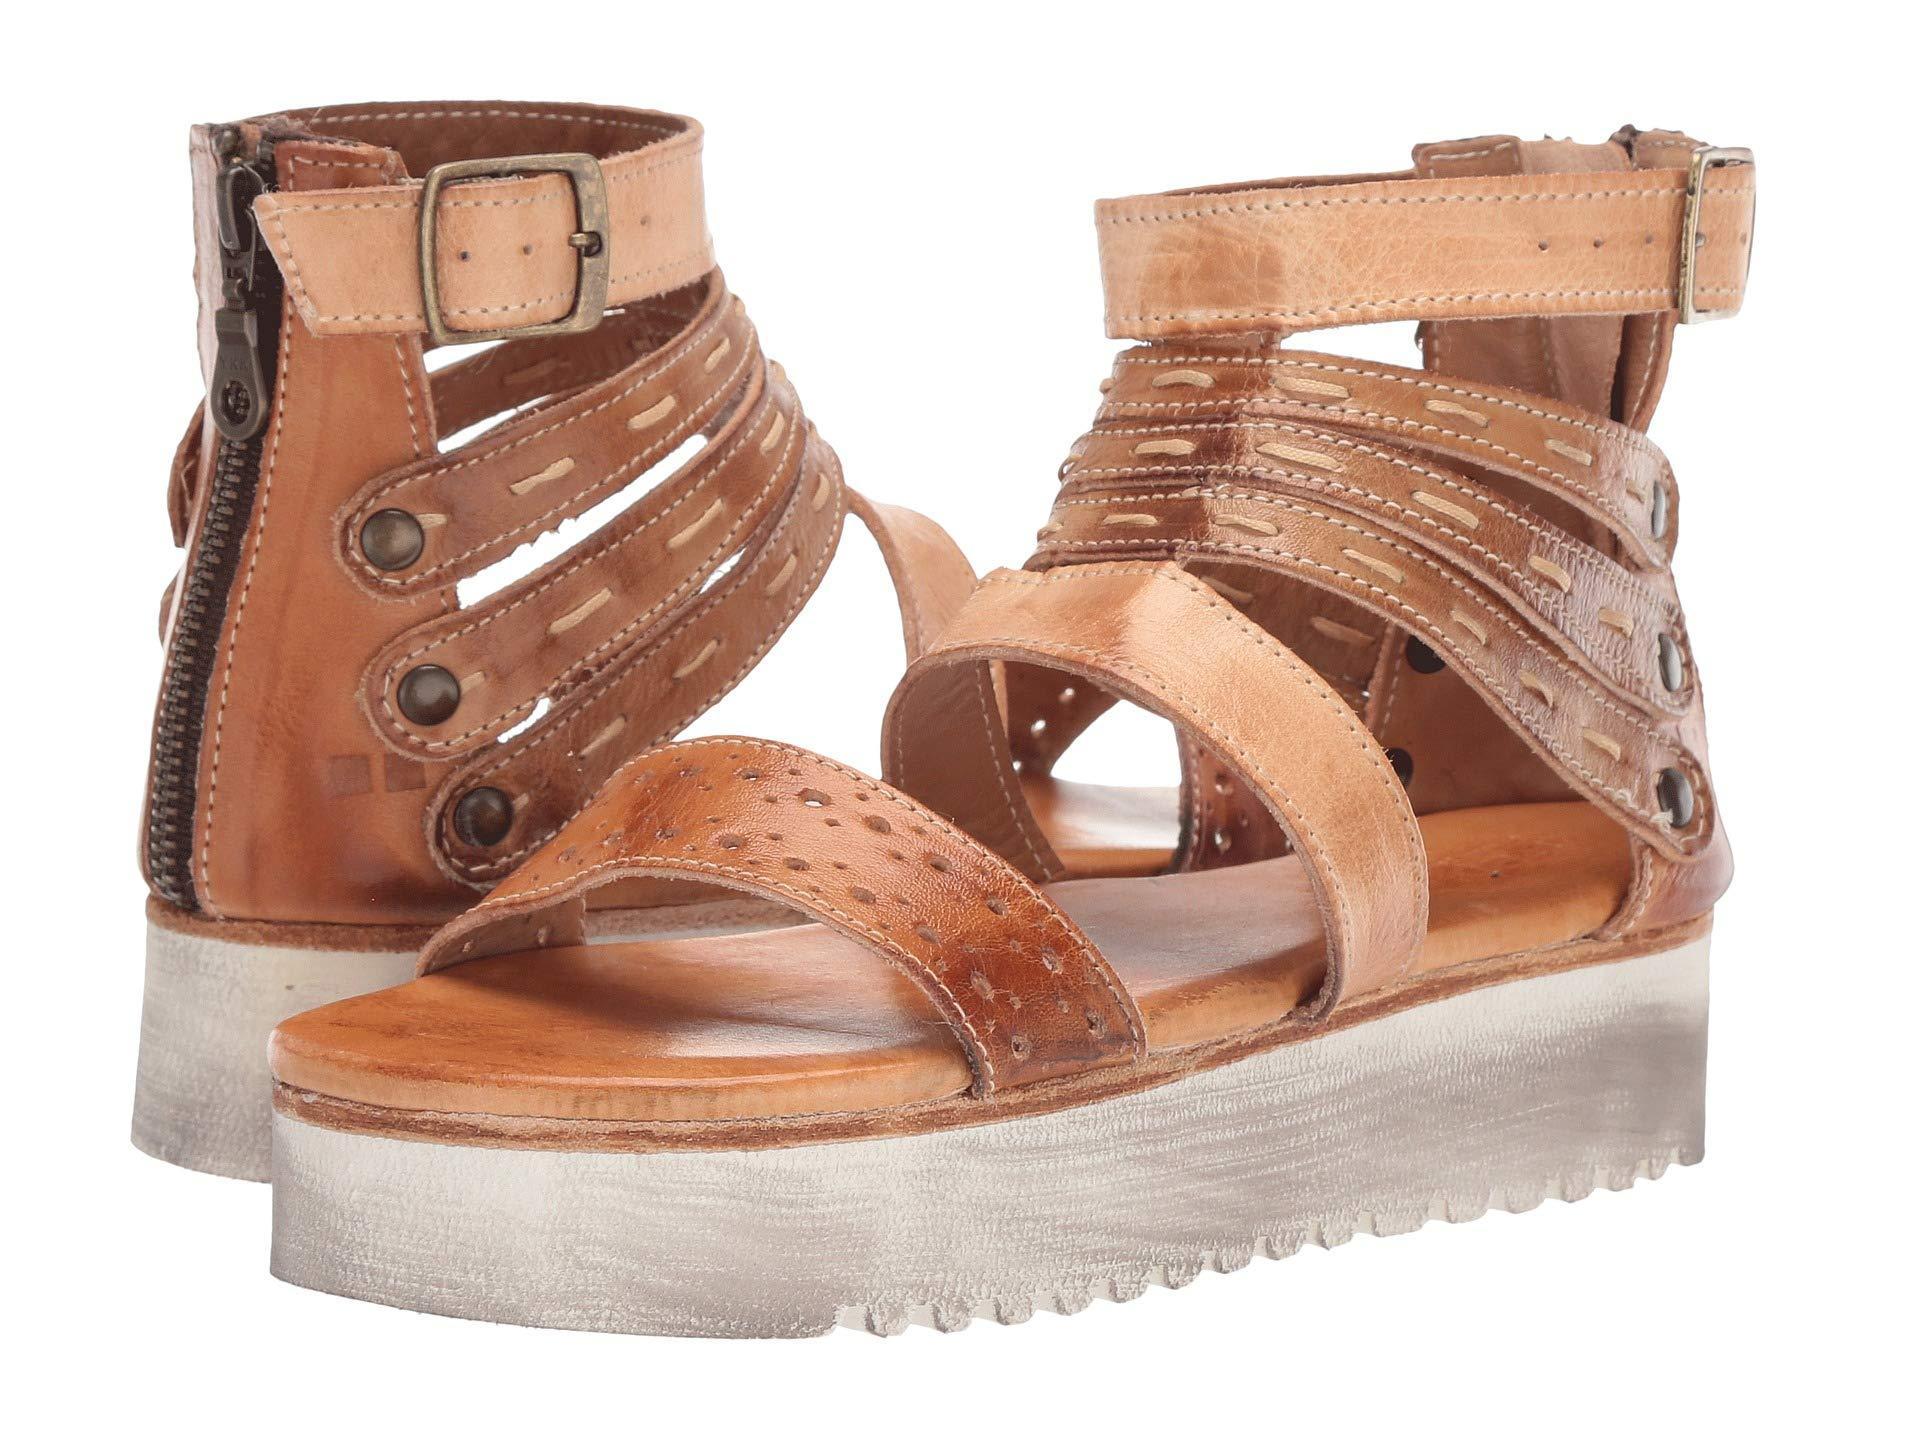 9ed89d34b99adc Lyst - Bed Stu Artemia (bone Mustard tan Rustic) Women s Shoes in Brown